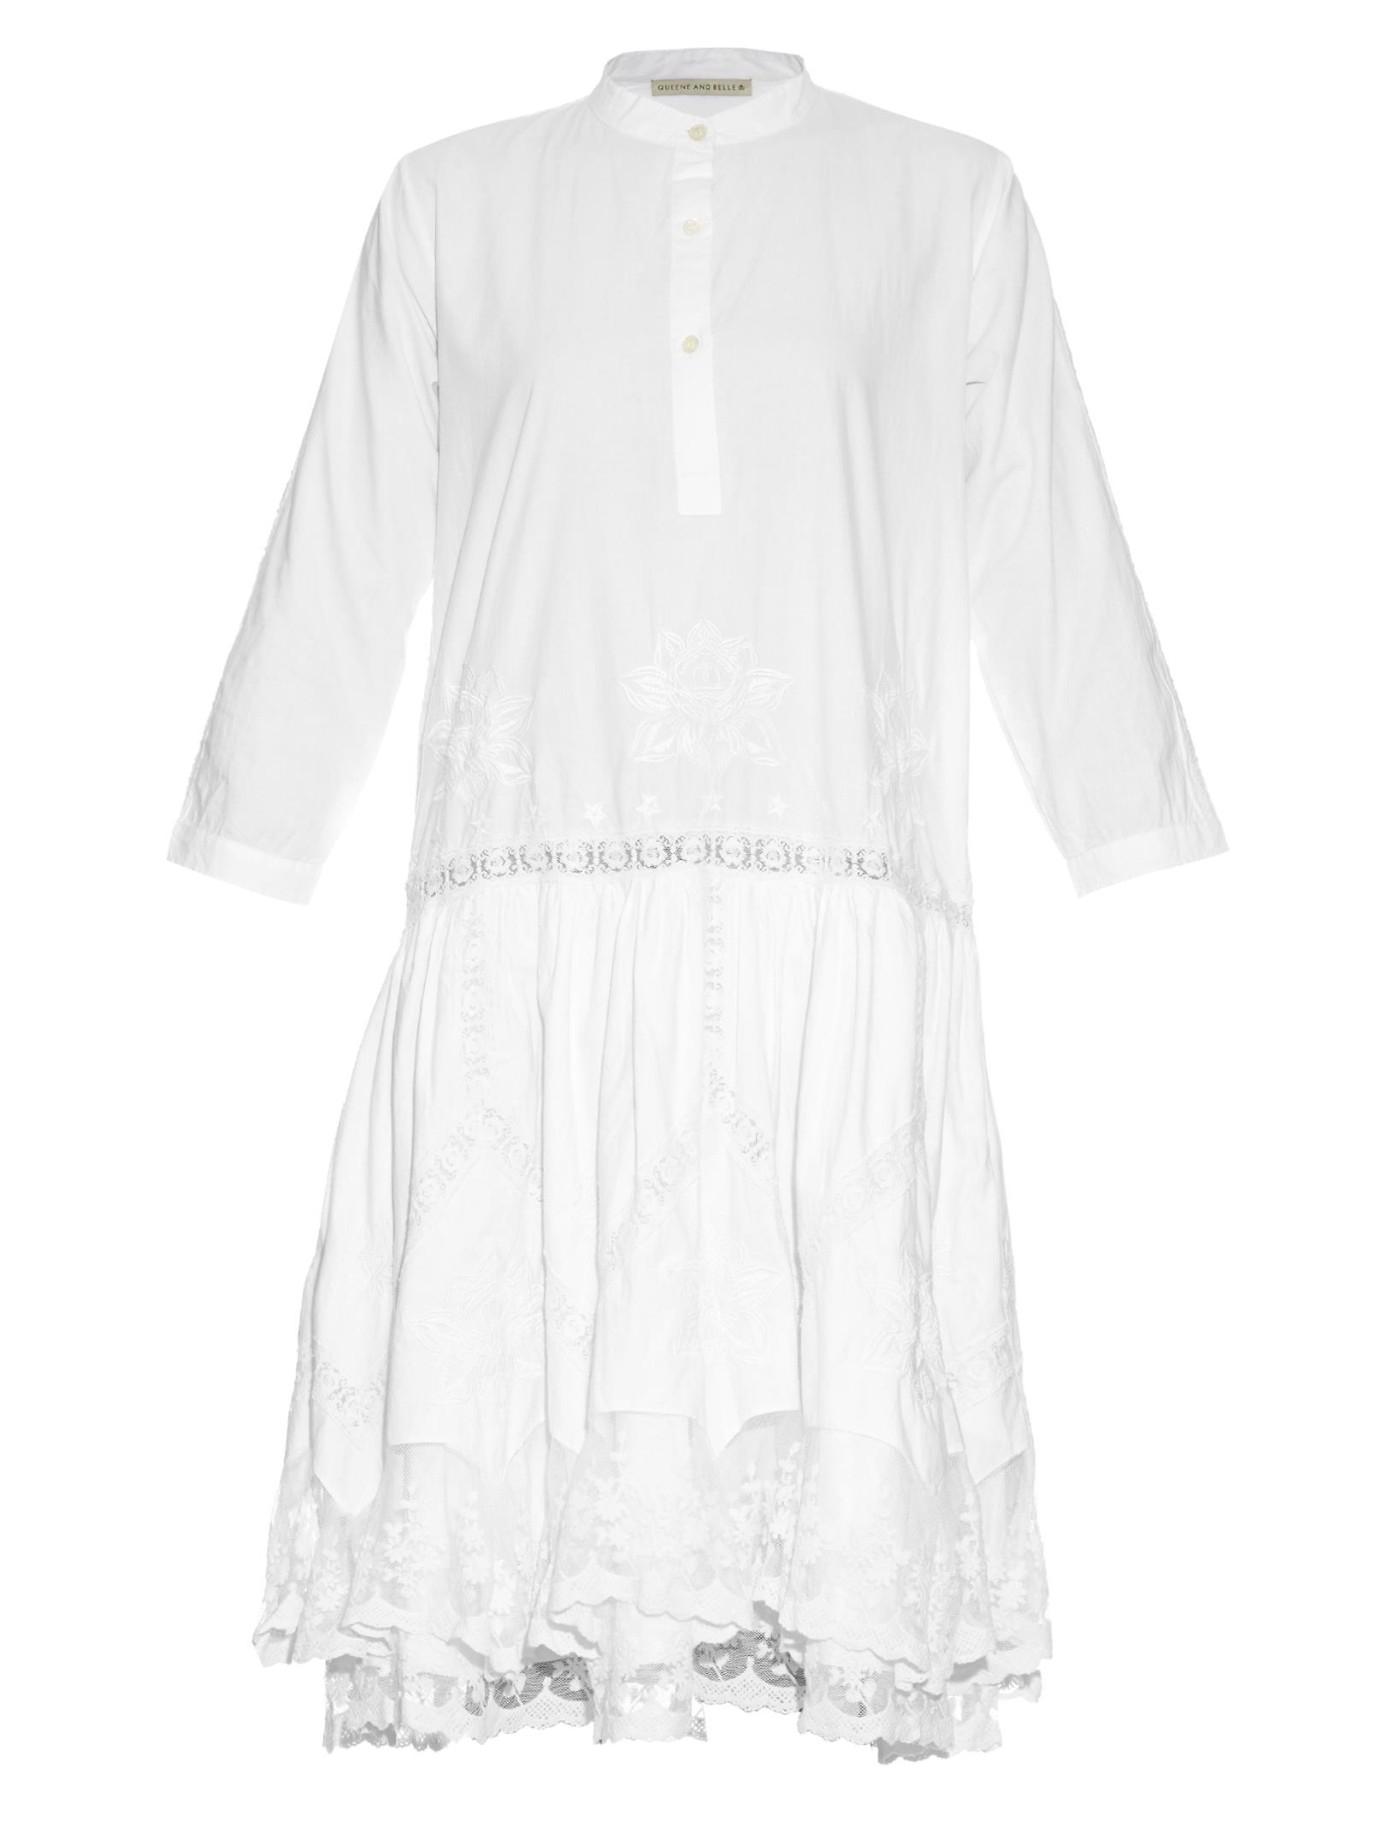 Prairie cotton clothing online